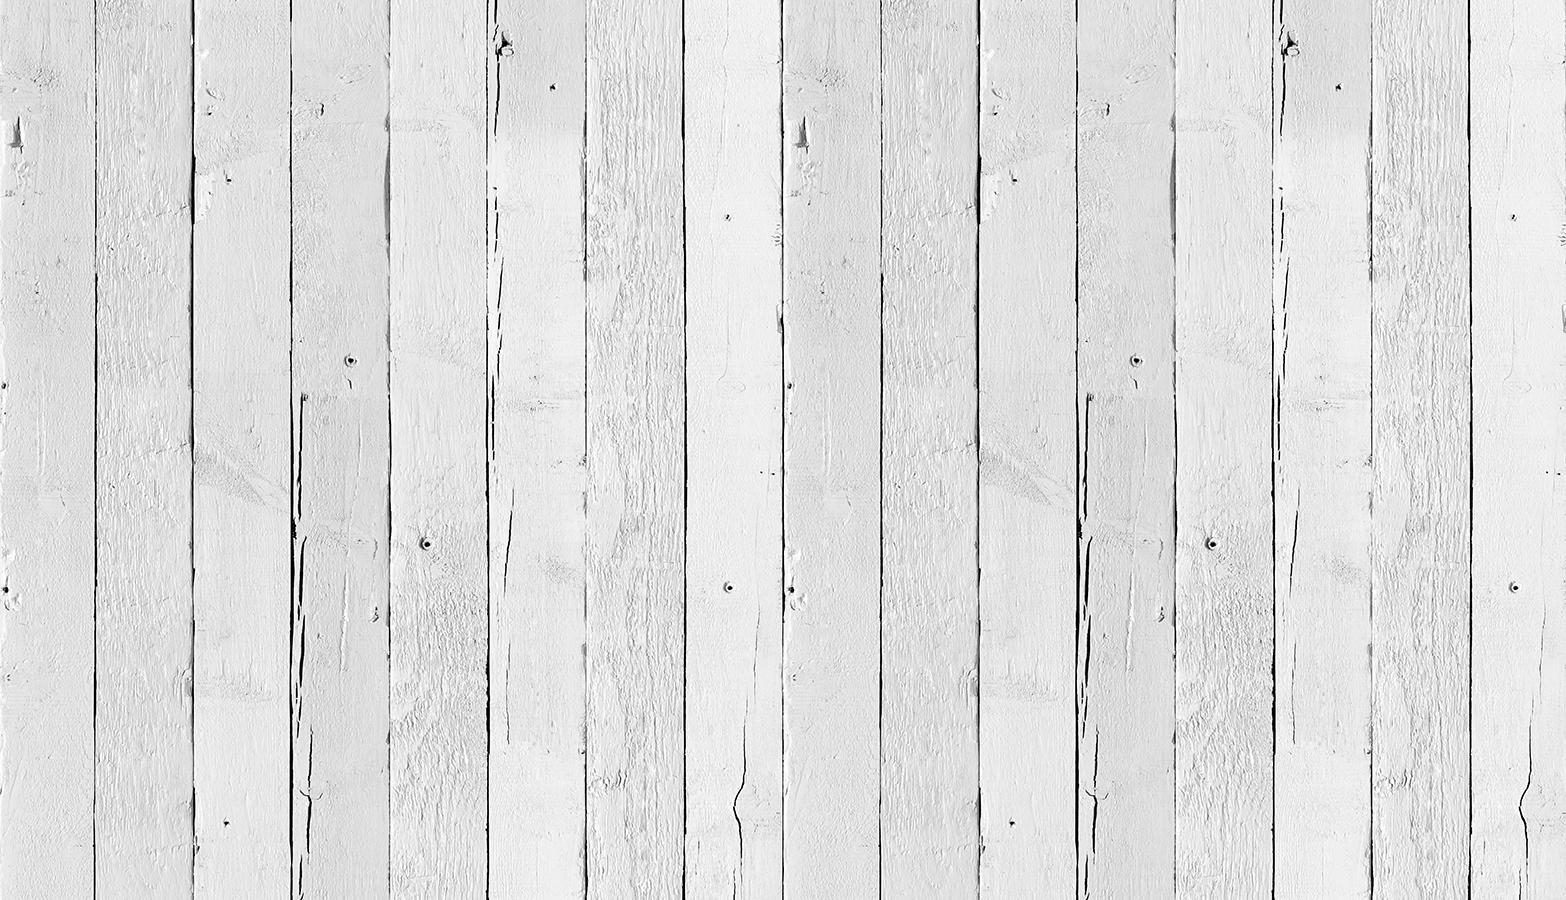 Piet hein eek scrapwood wallpaper modern wallpaper los angeles - Scrapwood Wallpaper 2 By Piet Hein Eek